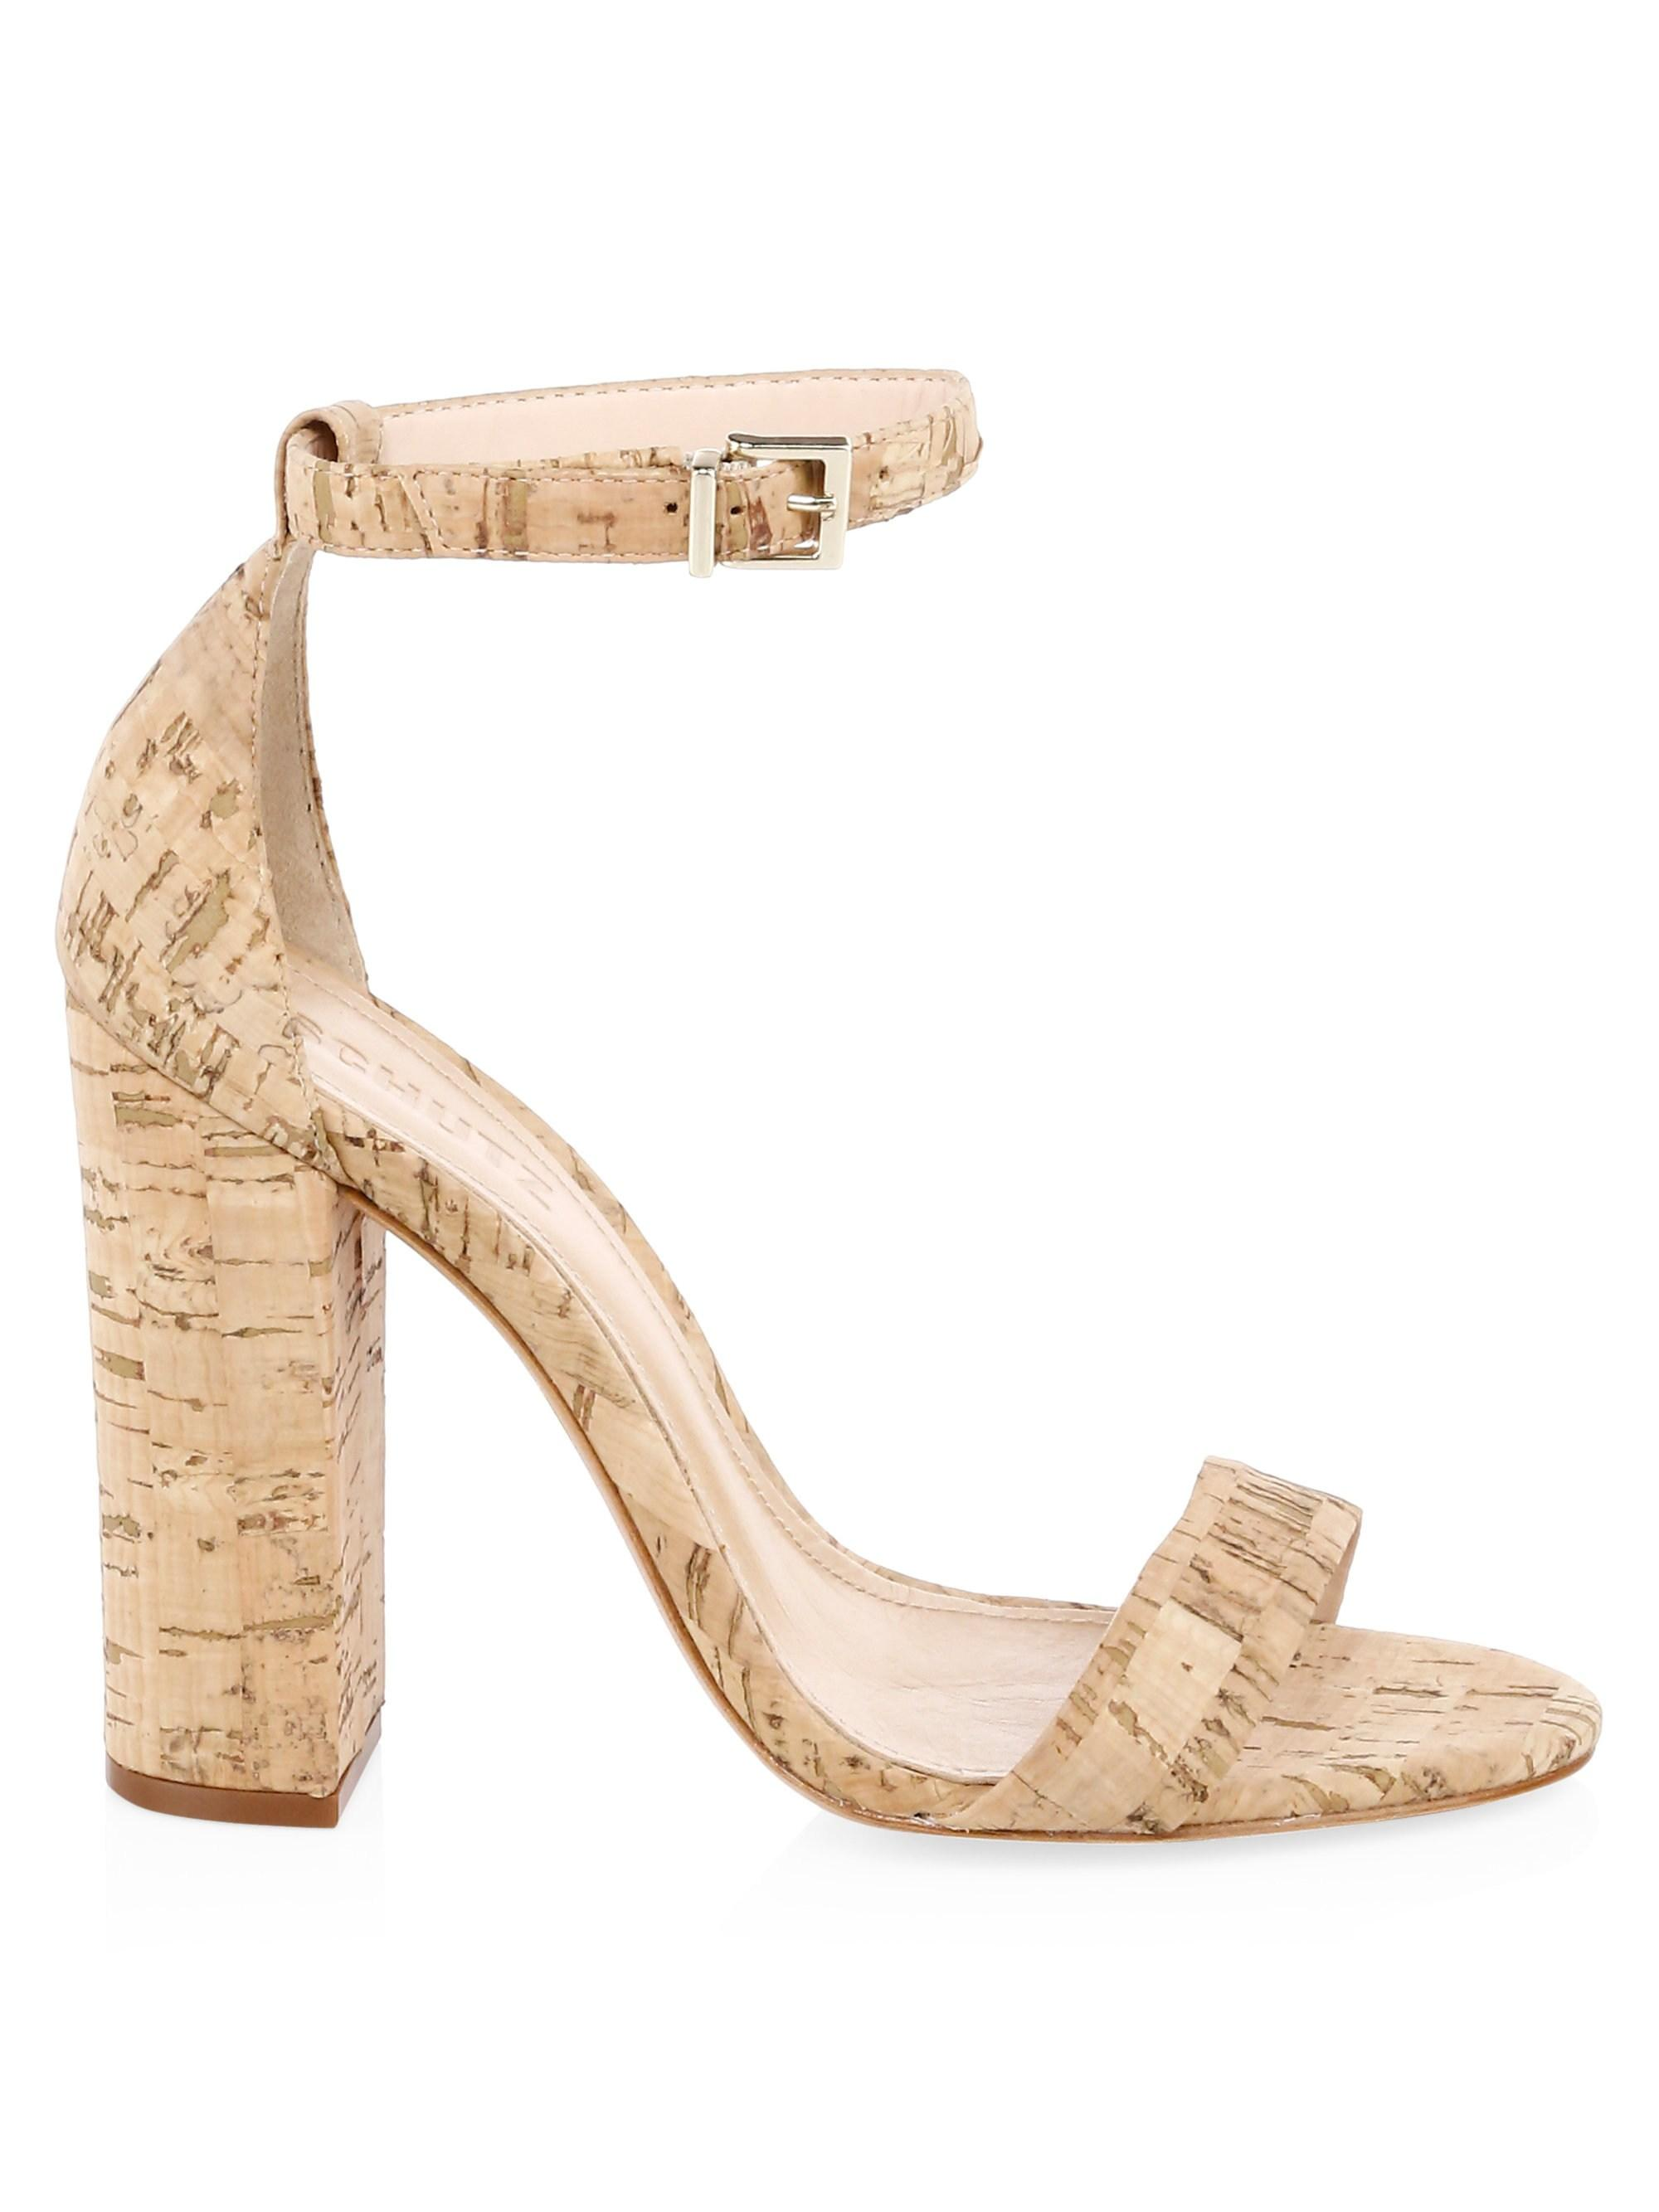 6a85b6e5161e Lyst - Schutz Enida Cork Ankle-strap Heels in Natural